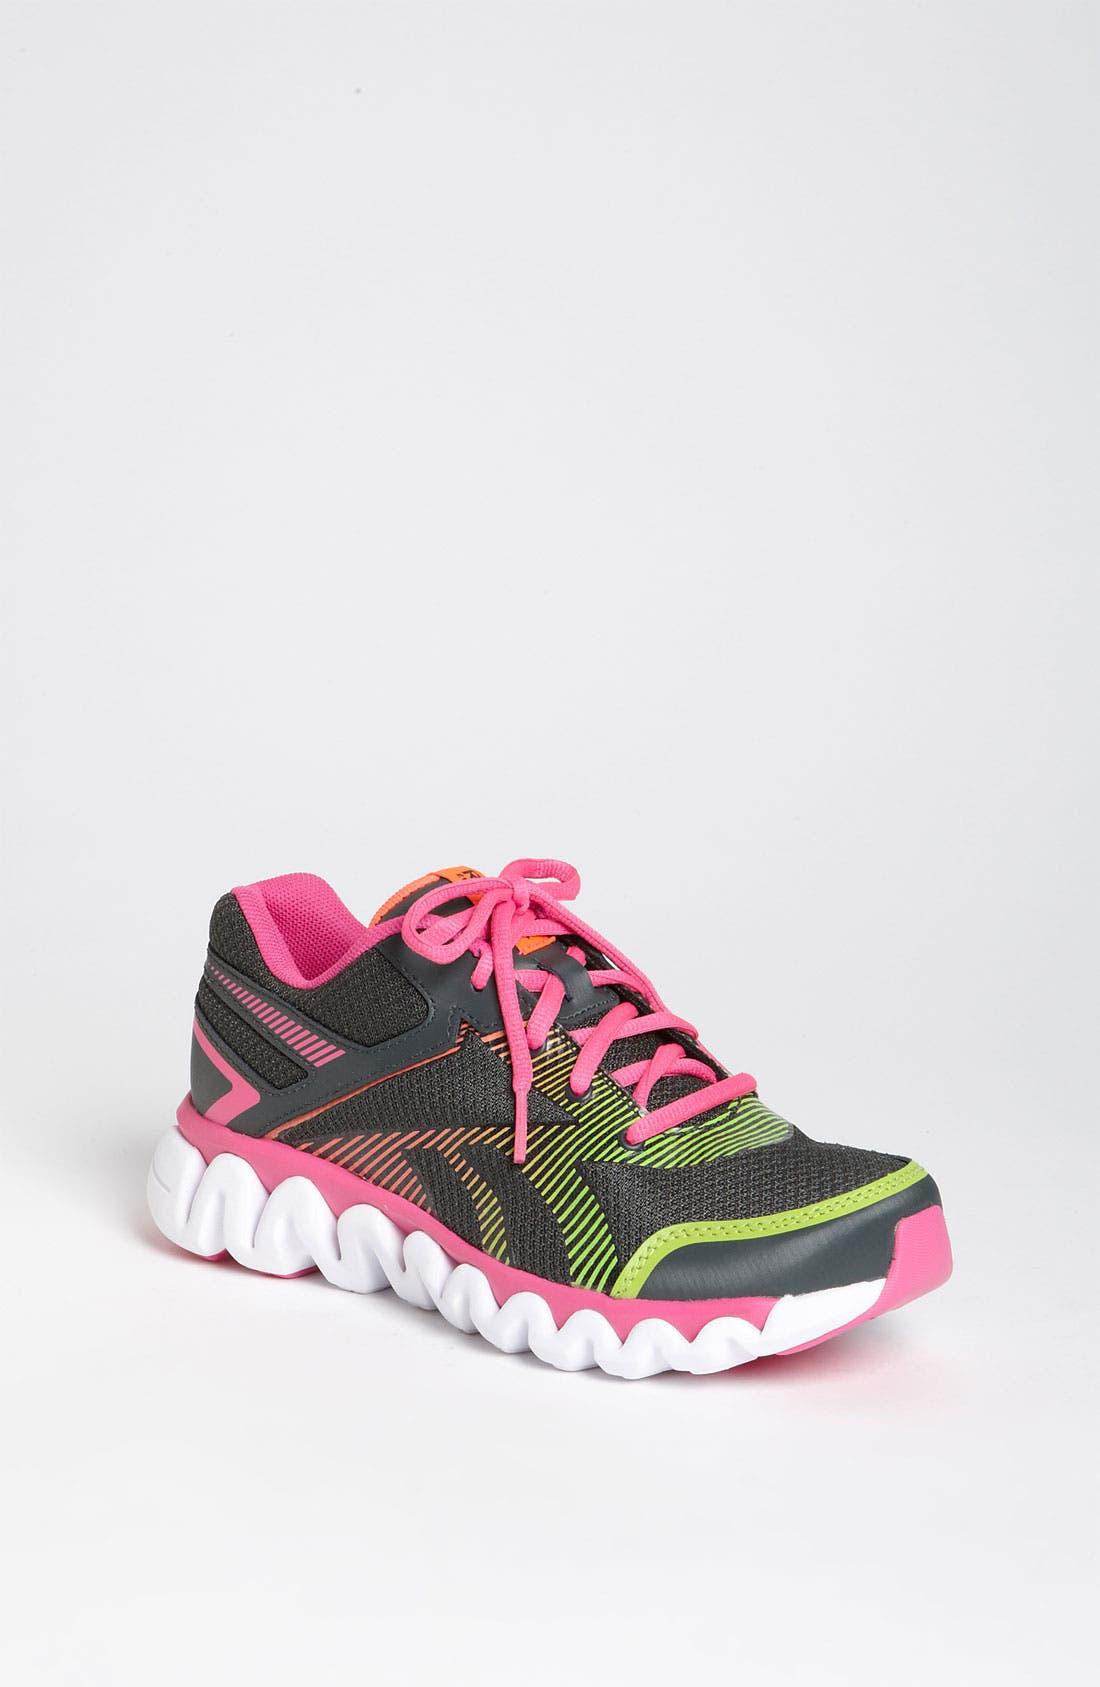 Main Image - Reebok 'ZigLite Electrify' Sneaker (Toddler, Little Kid & Big Kid)